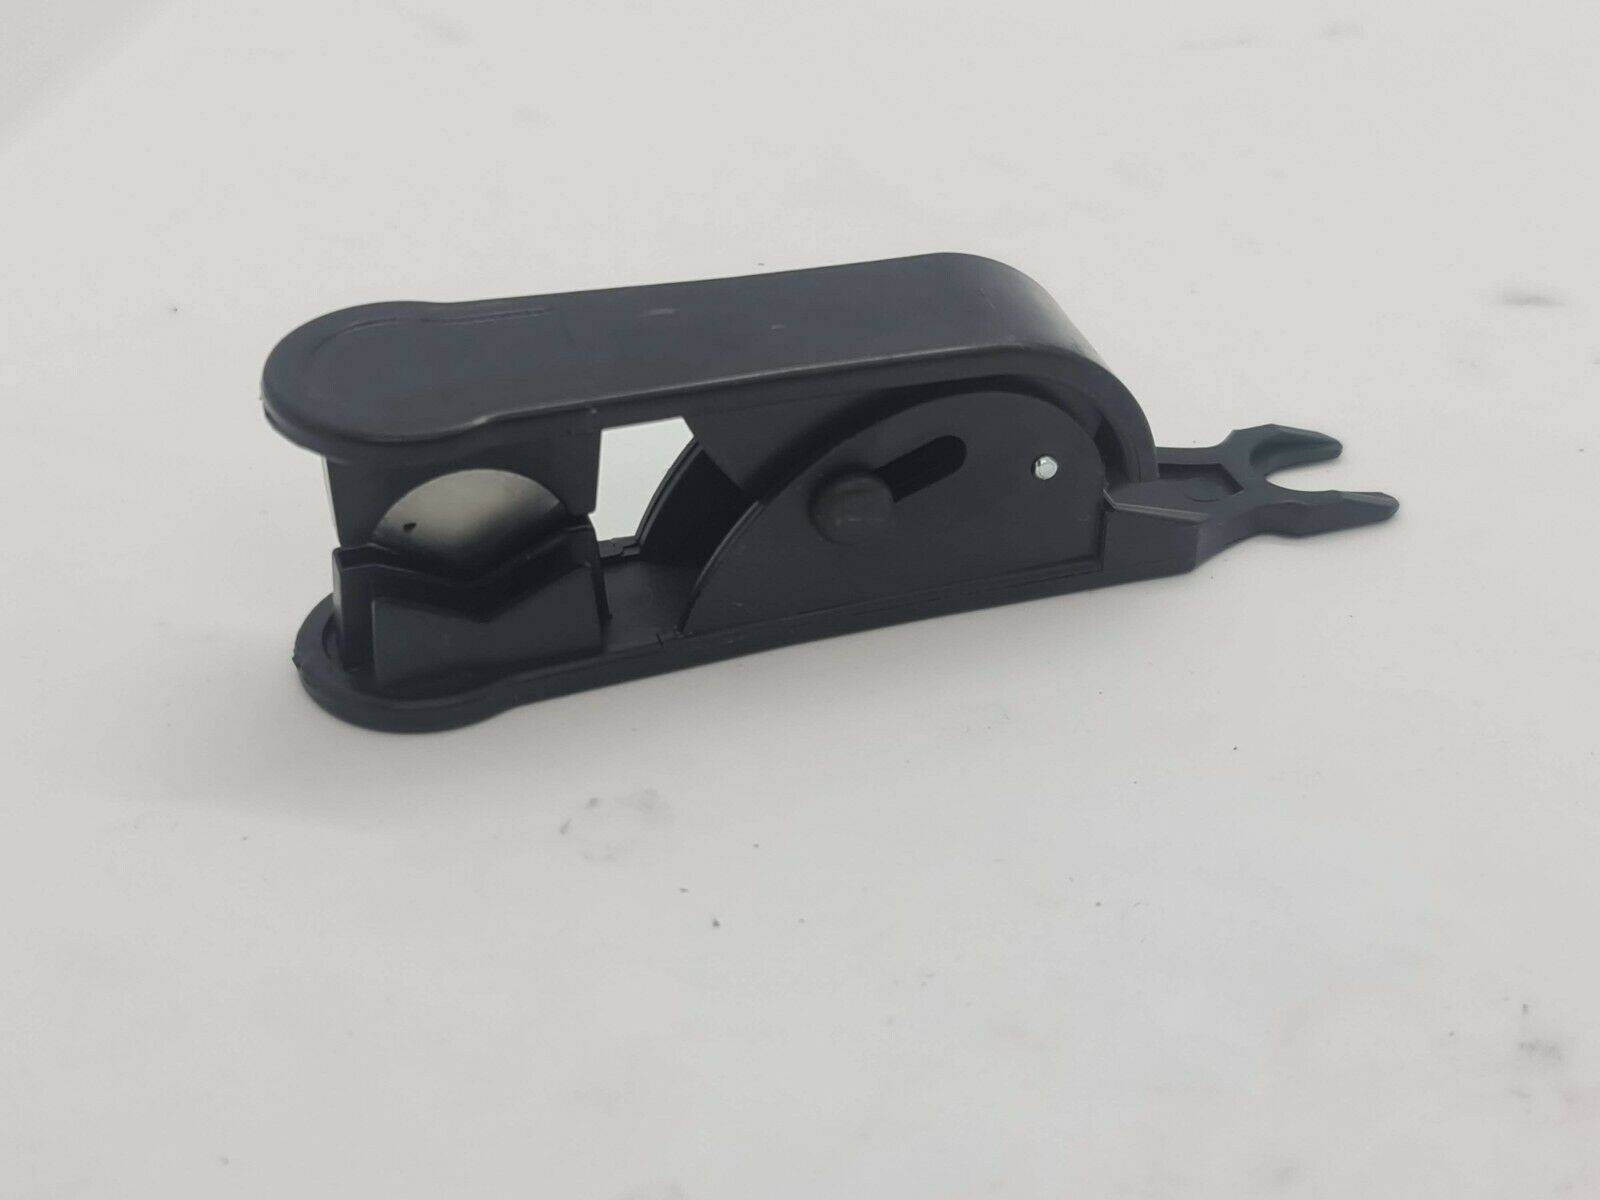 PTFE Tube Cutter, cutting tool for 3d printer bowden tube RO/DI Hose Square Cut.